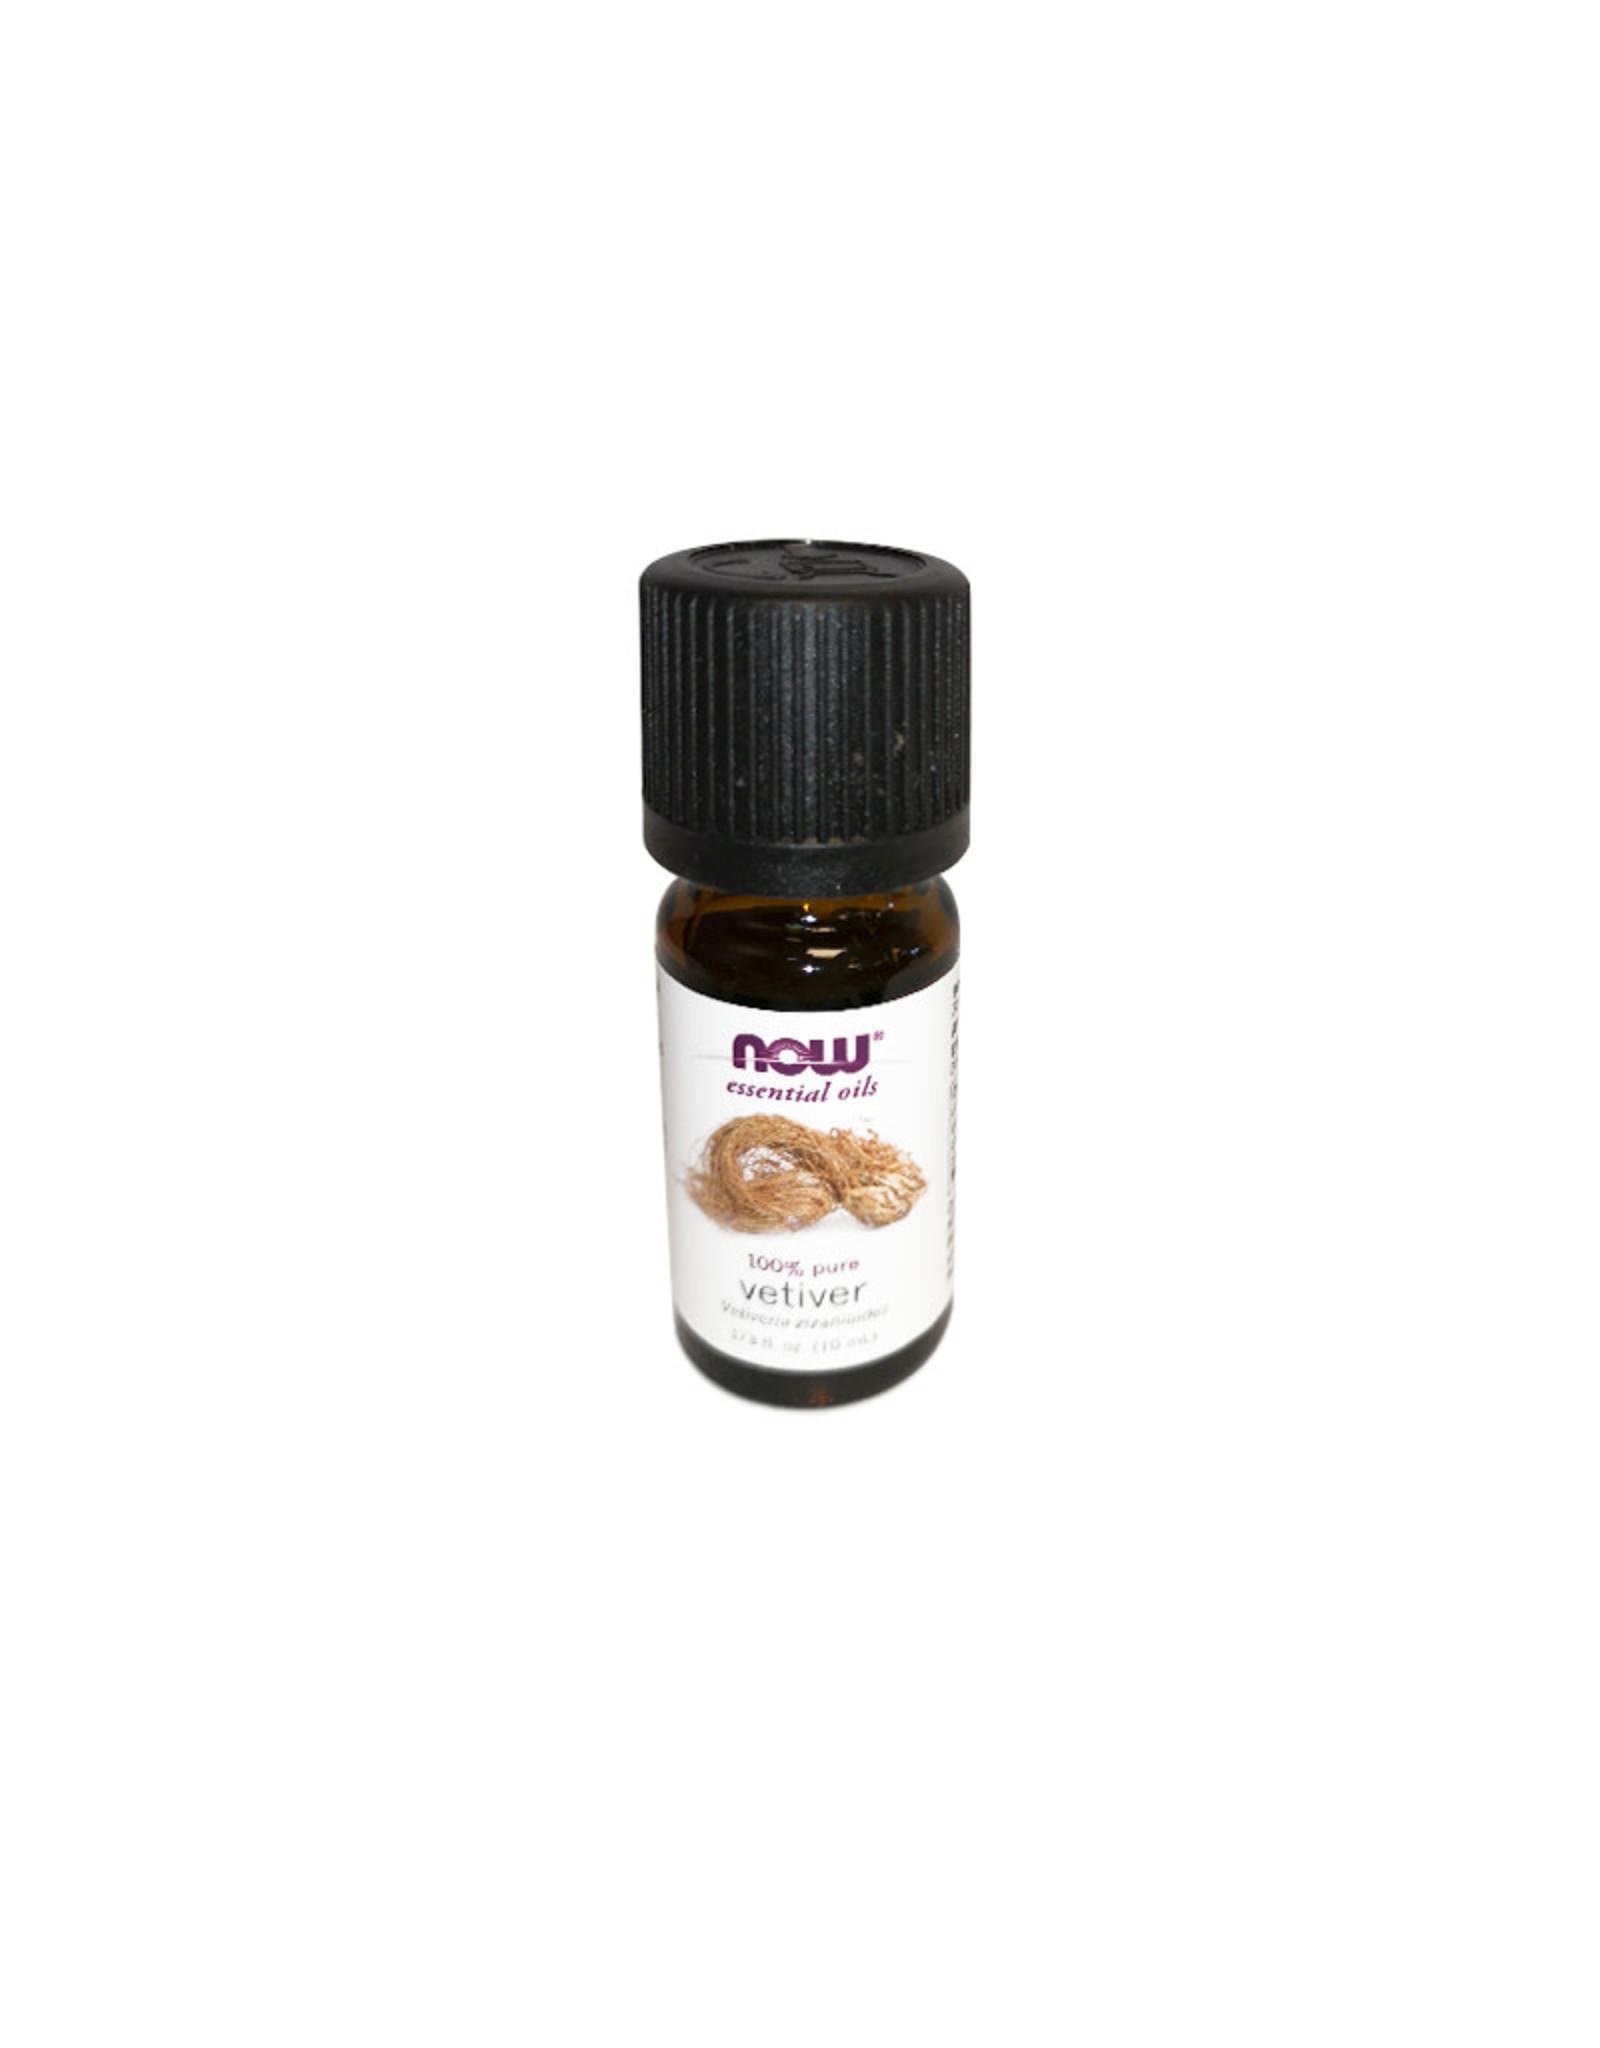 NOW Essential Oils NOW Essential Oils - Vetiver Oil (10ml)